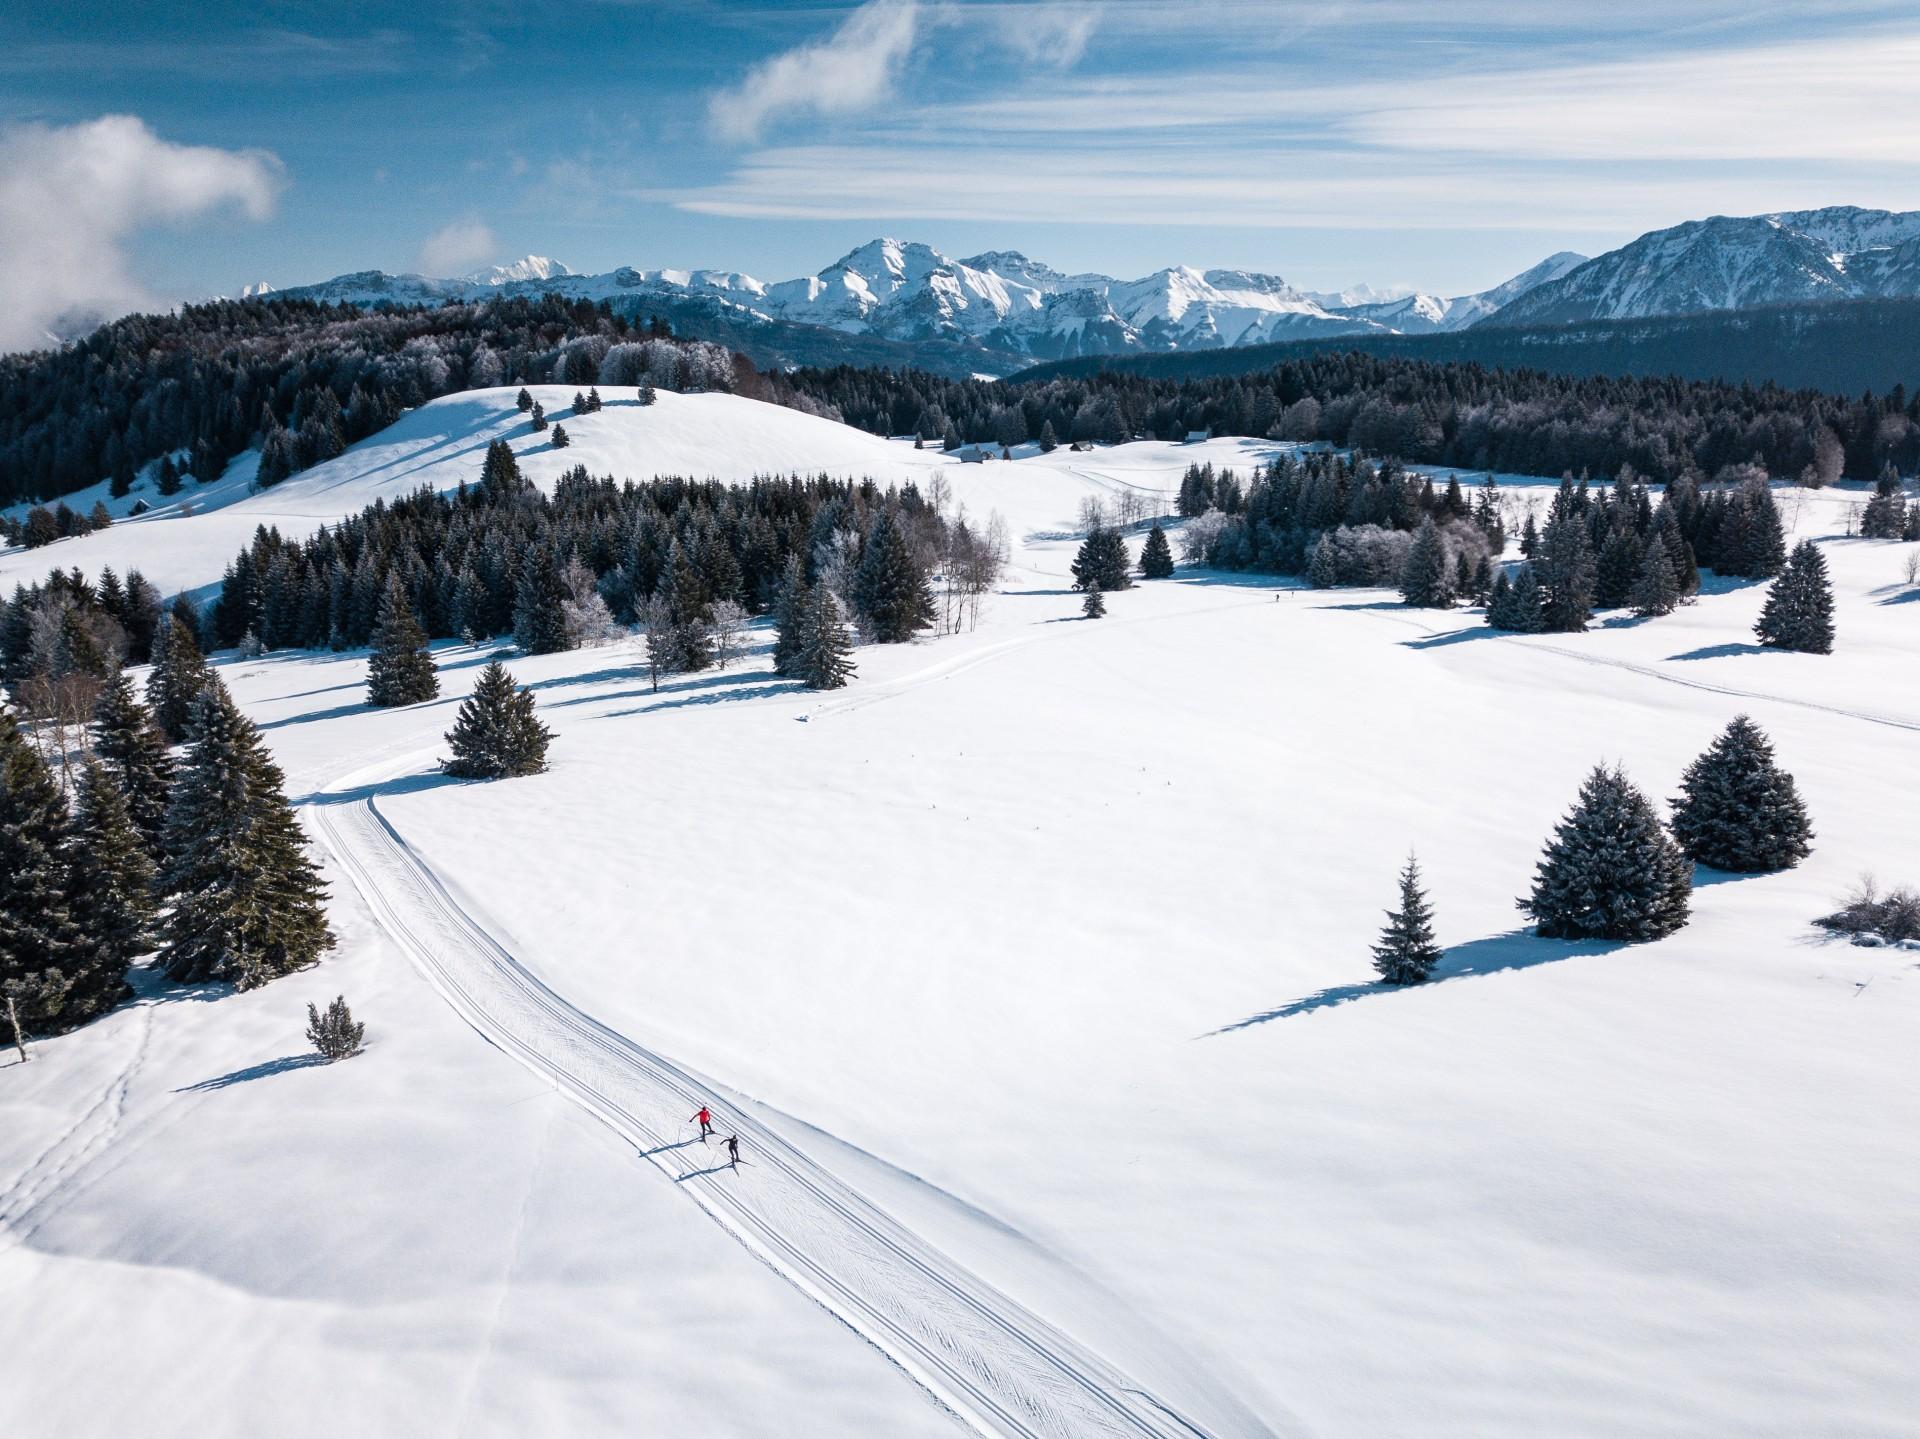 savoie-grand-revard-hiver-2019-peignee-verticale0168-434